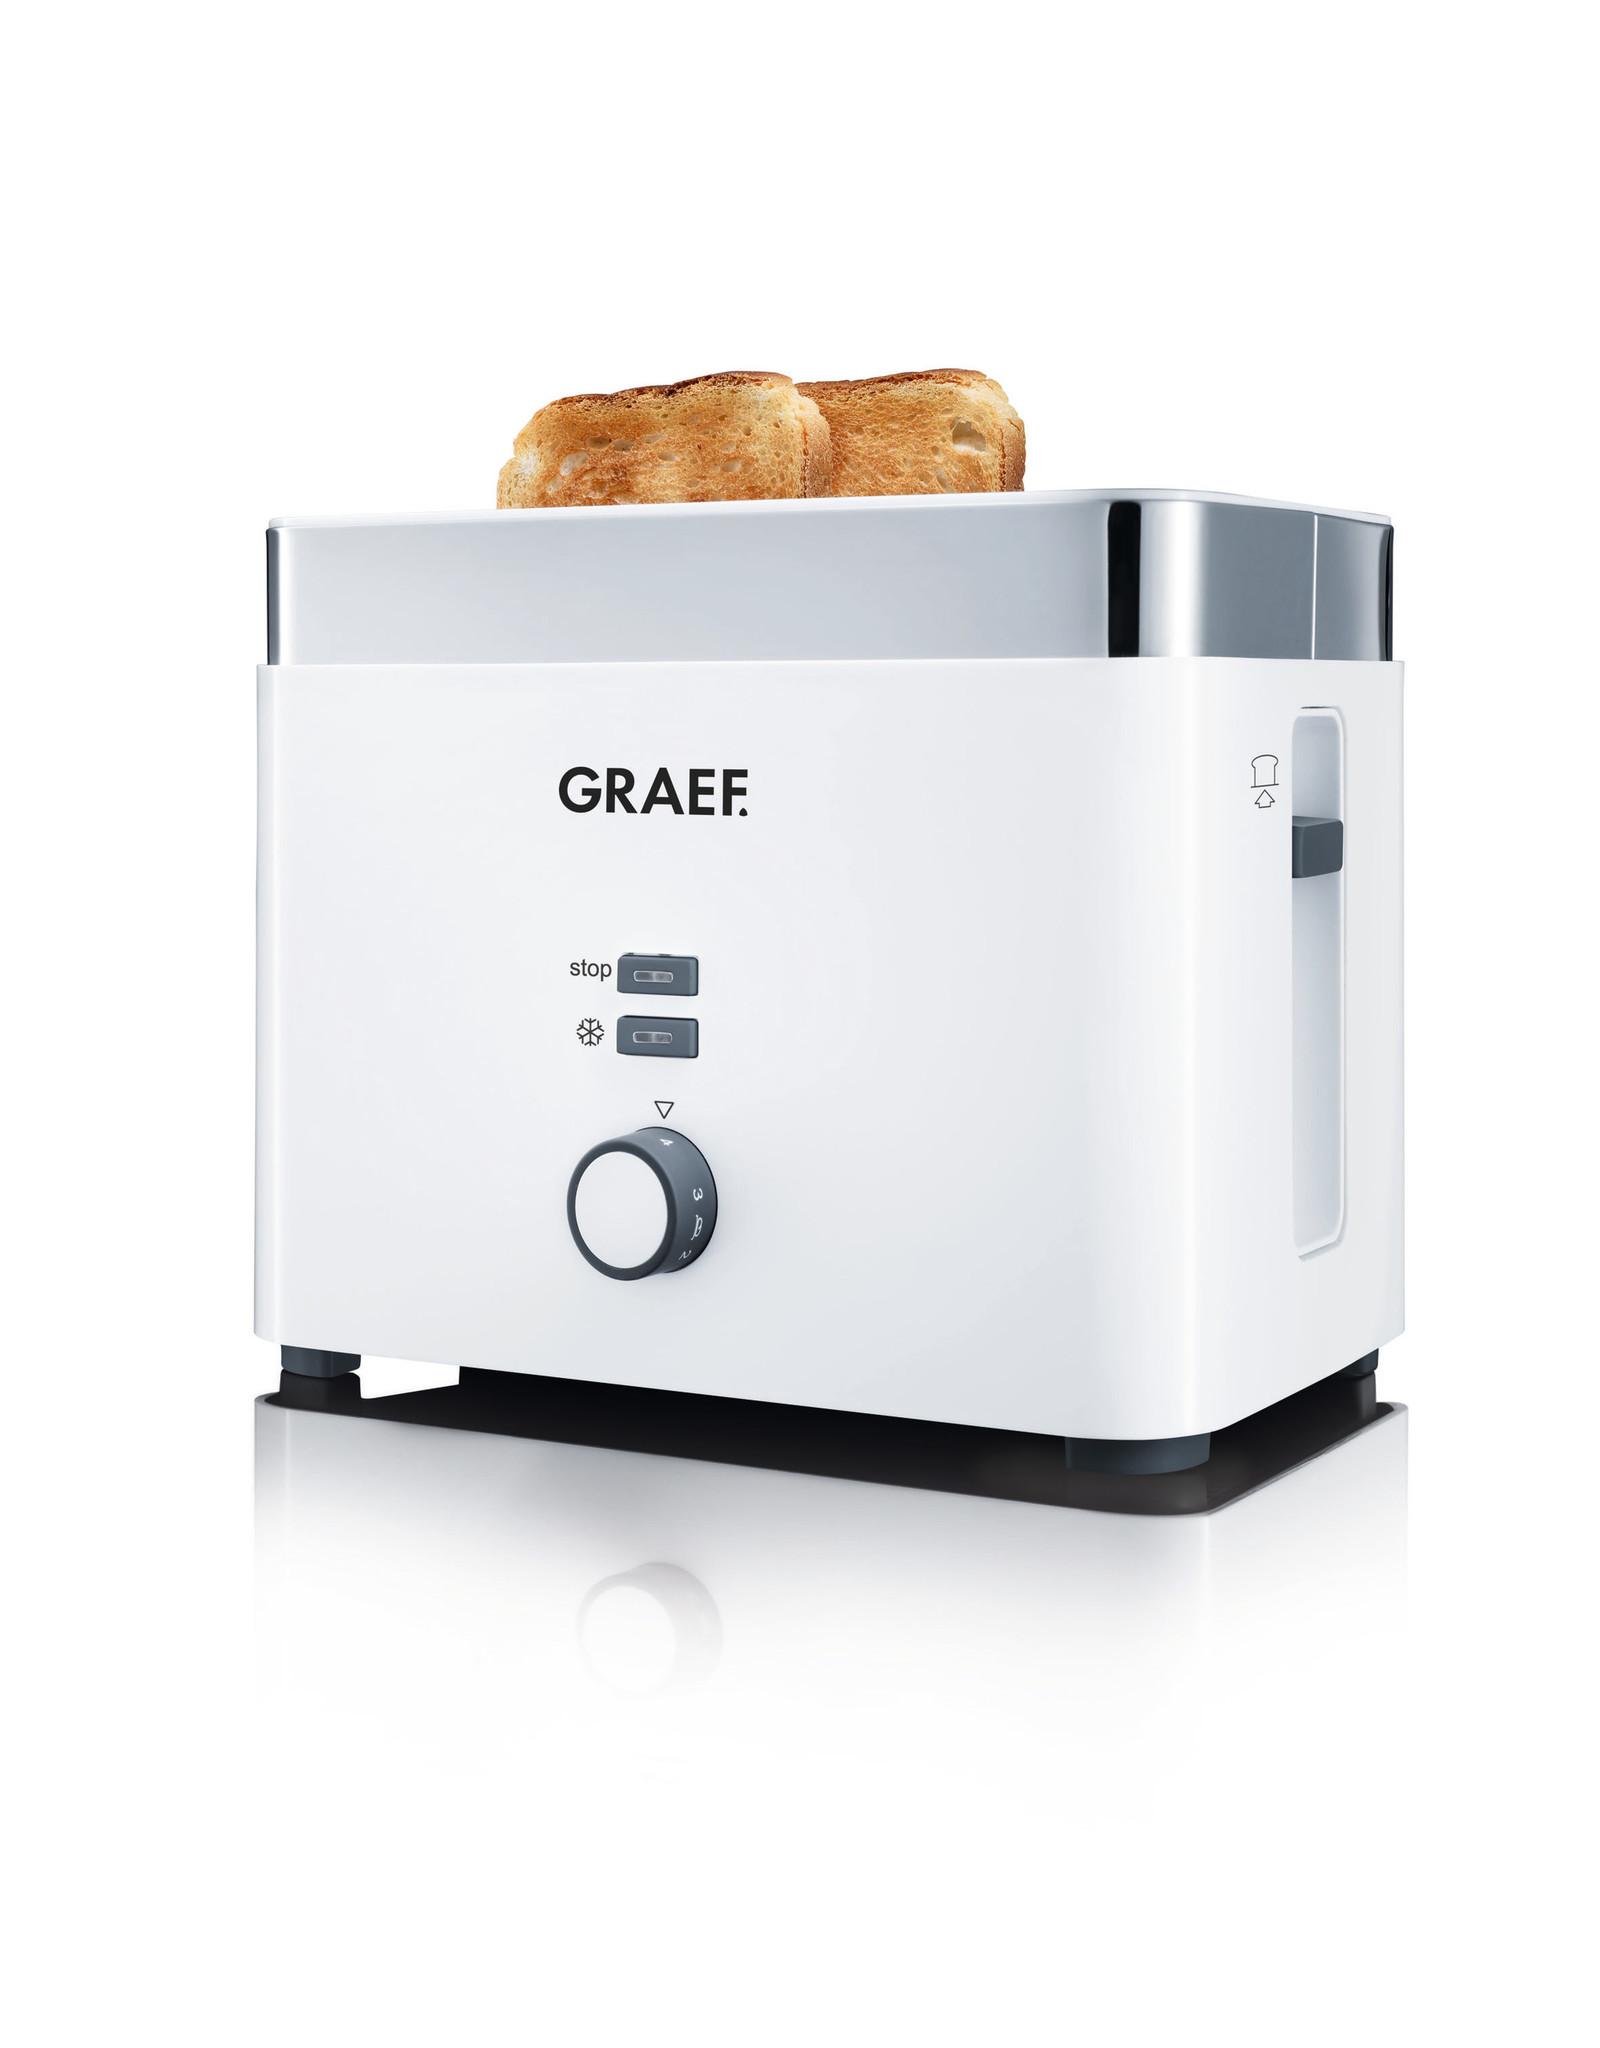 GRAEF GRAEF TO61 BROODROOSTER 45816   WIT